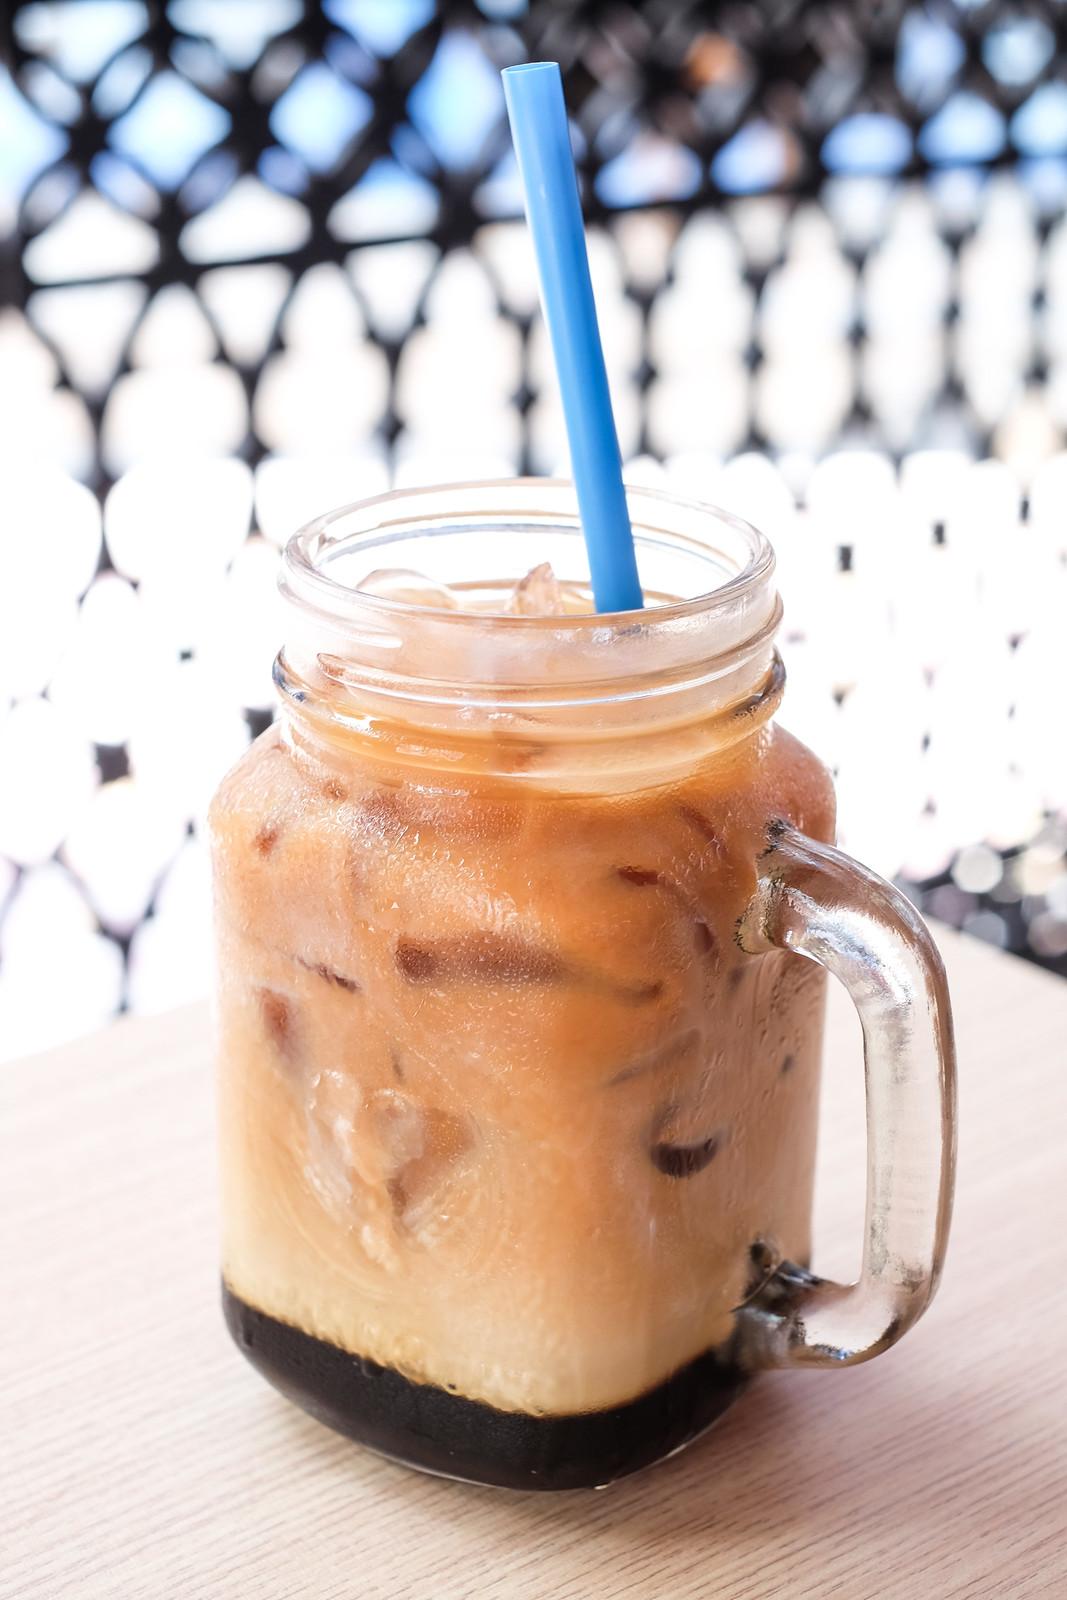 Chong Wen Ge cafe's Teh C Special